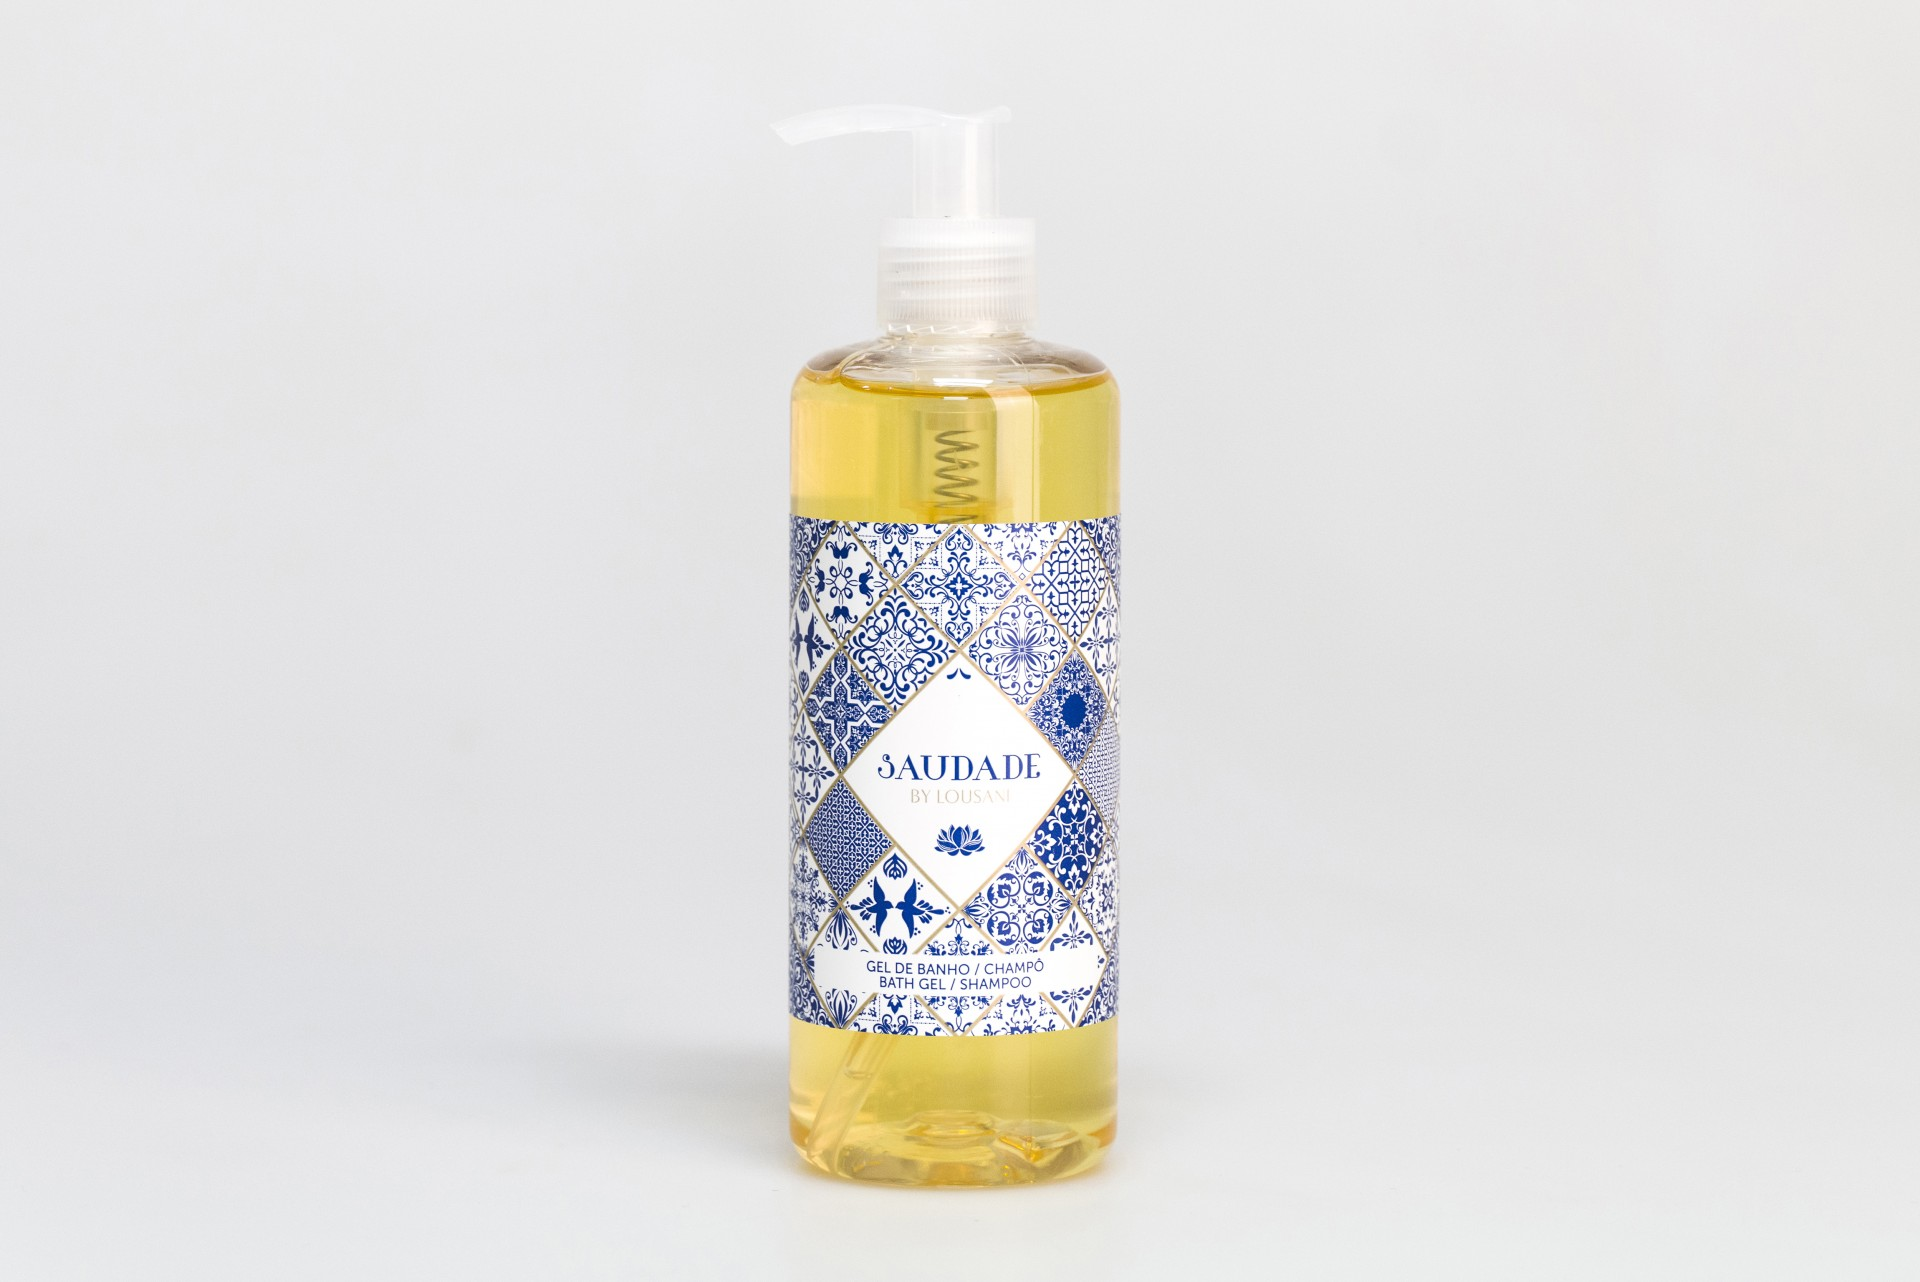 Gel Banho/Shampoo 300 ml Saudade